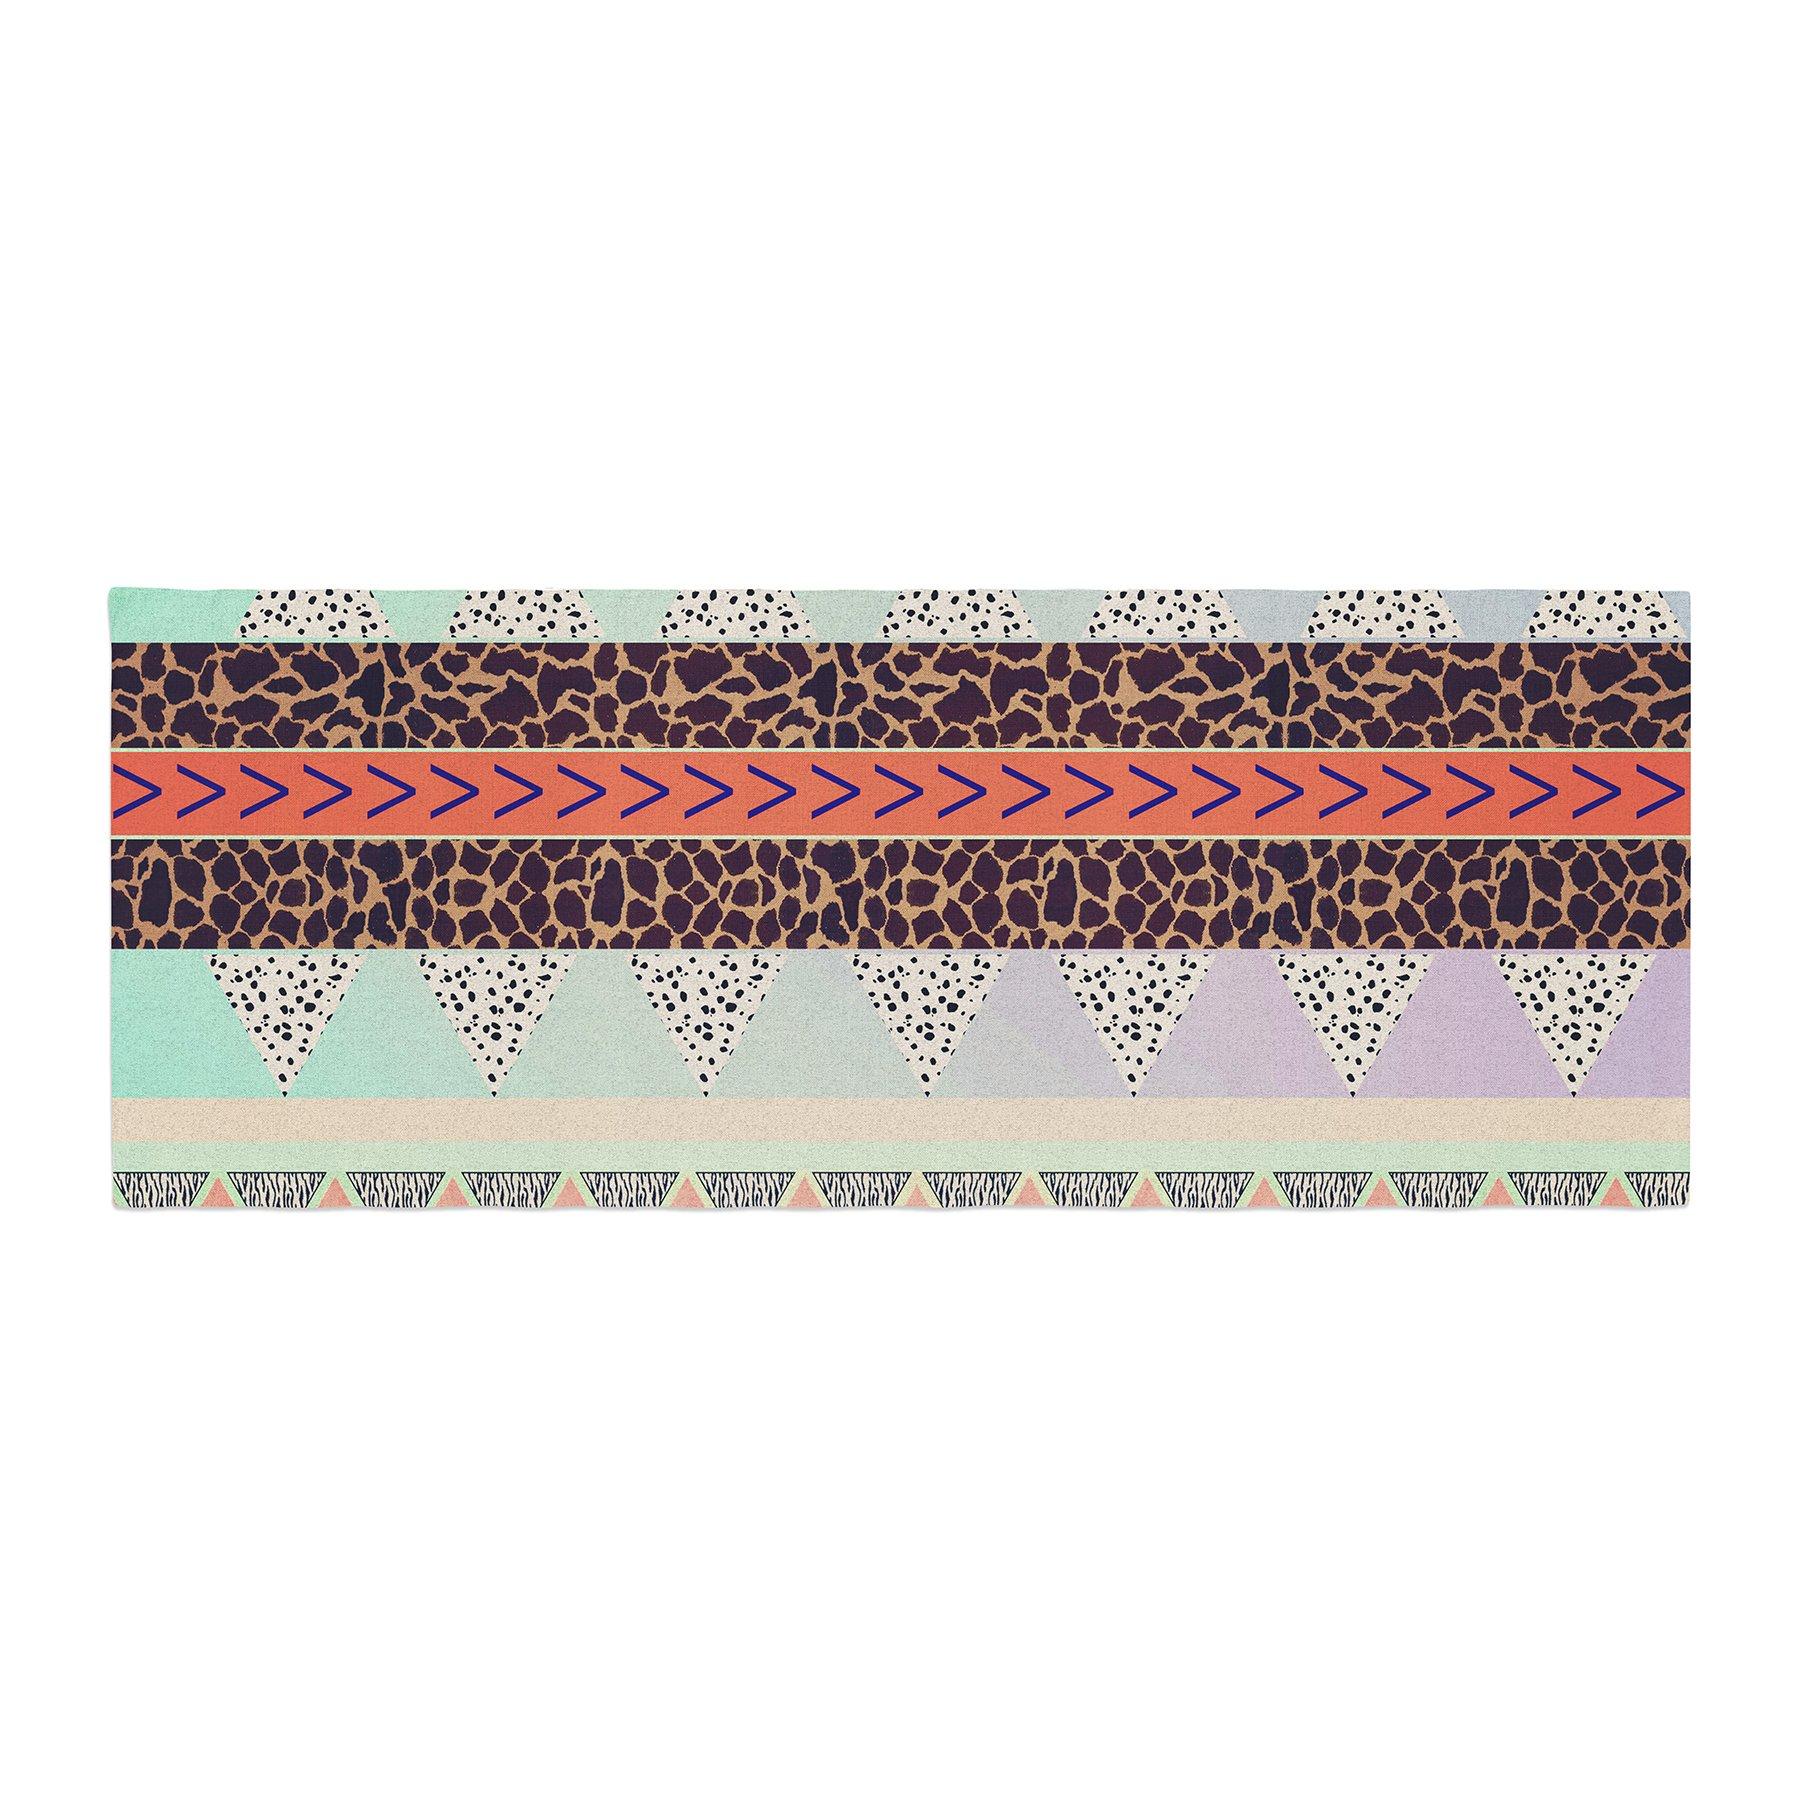 Kess InHouse Vasare Nar Animal Print Tribal Multicolor Pastel Bed Runner, 34'' x 86''